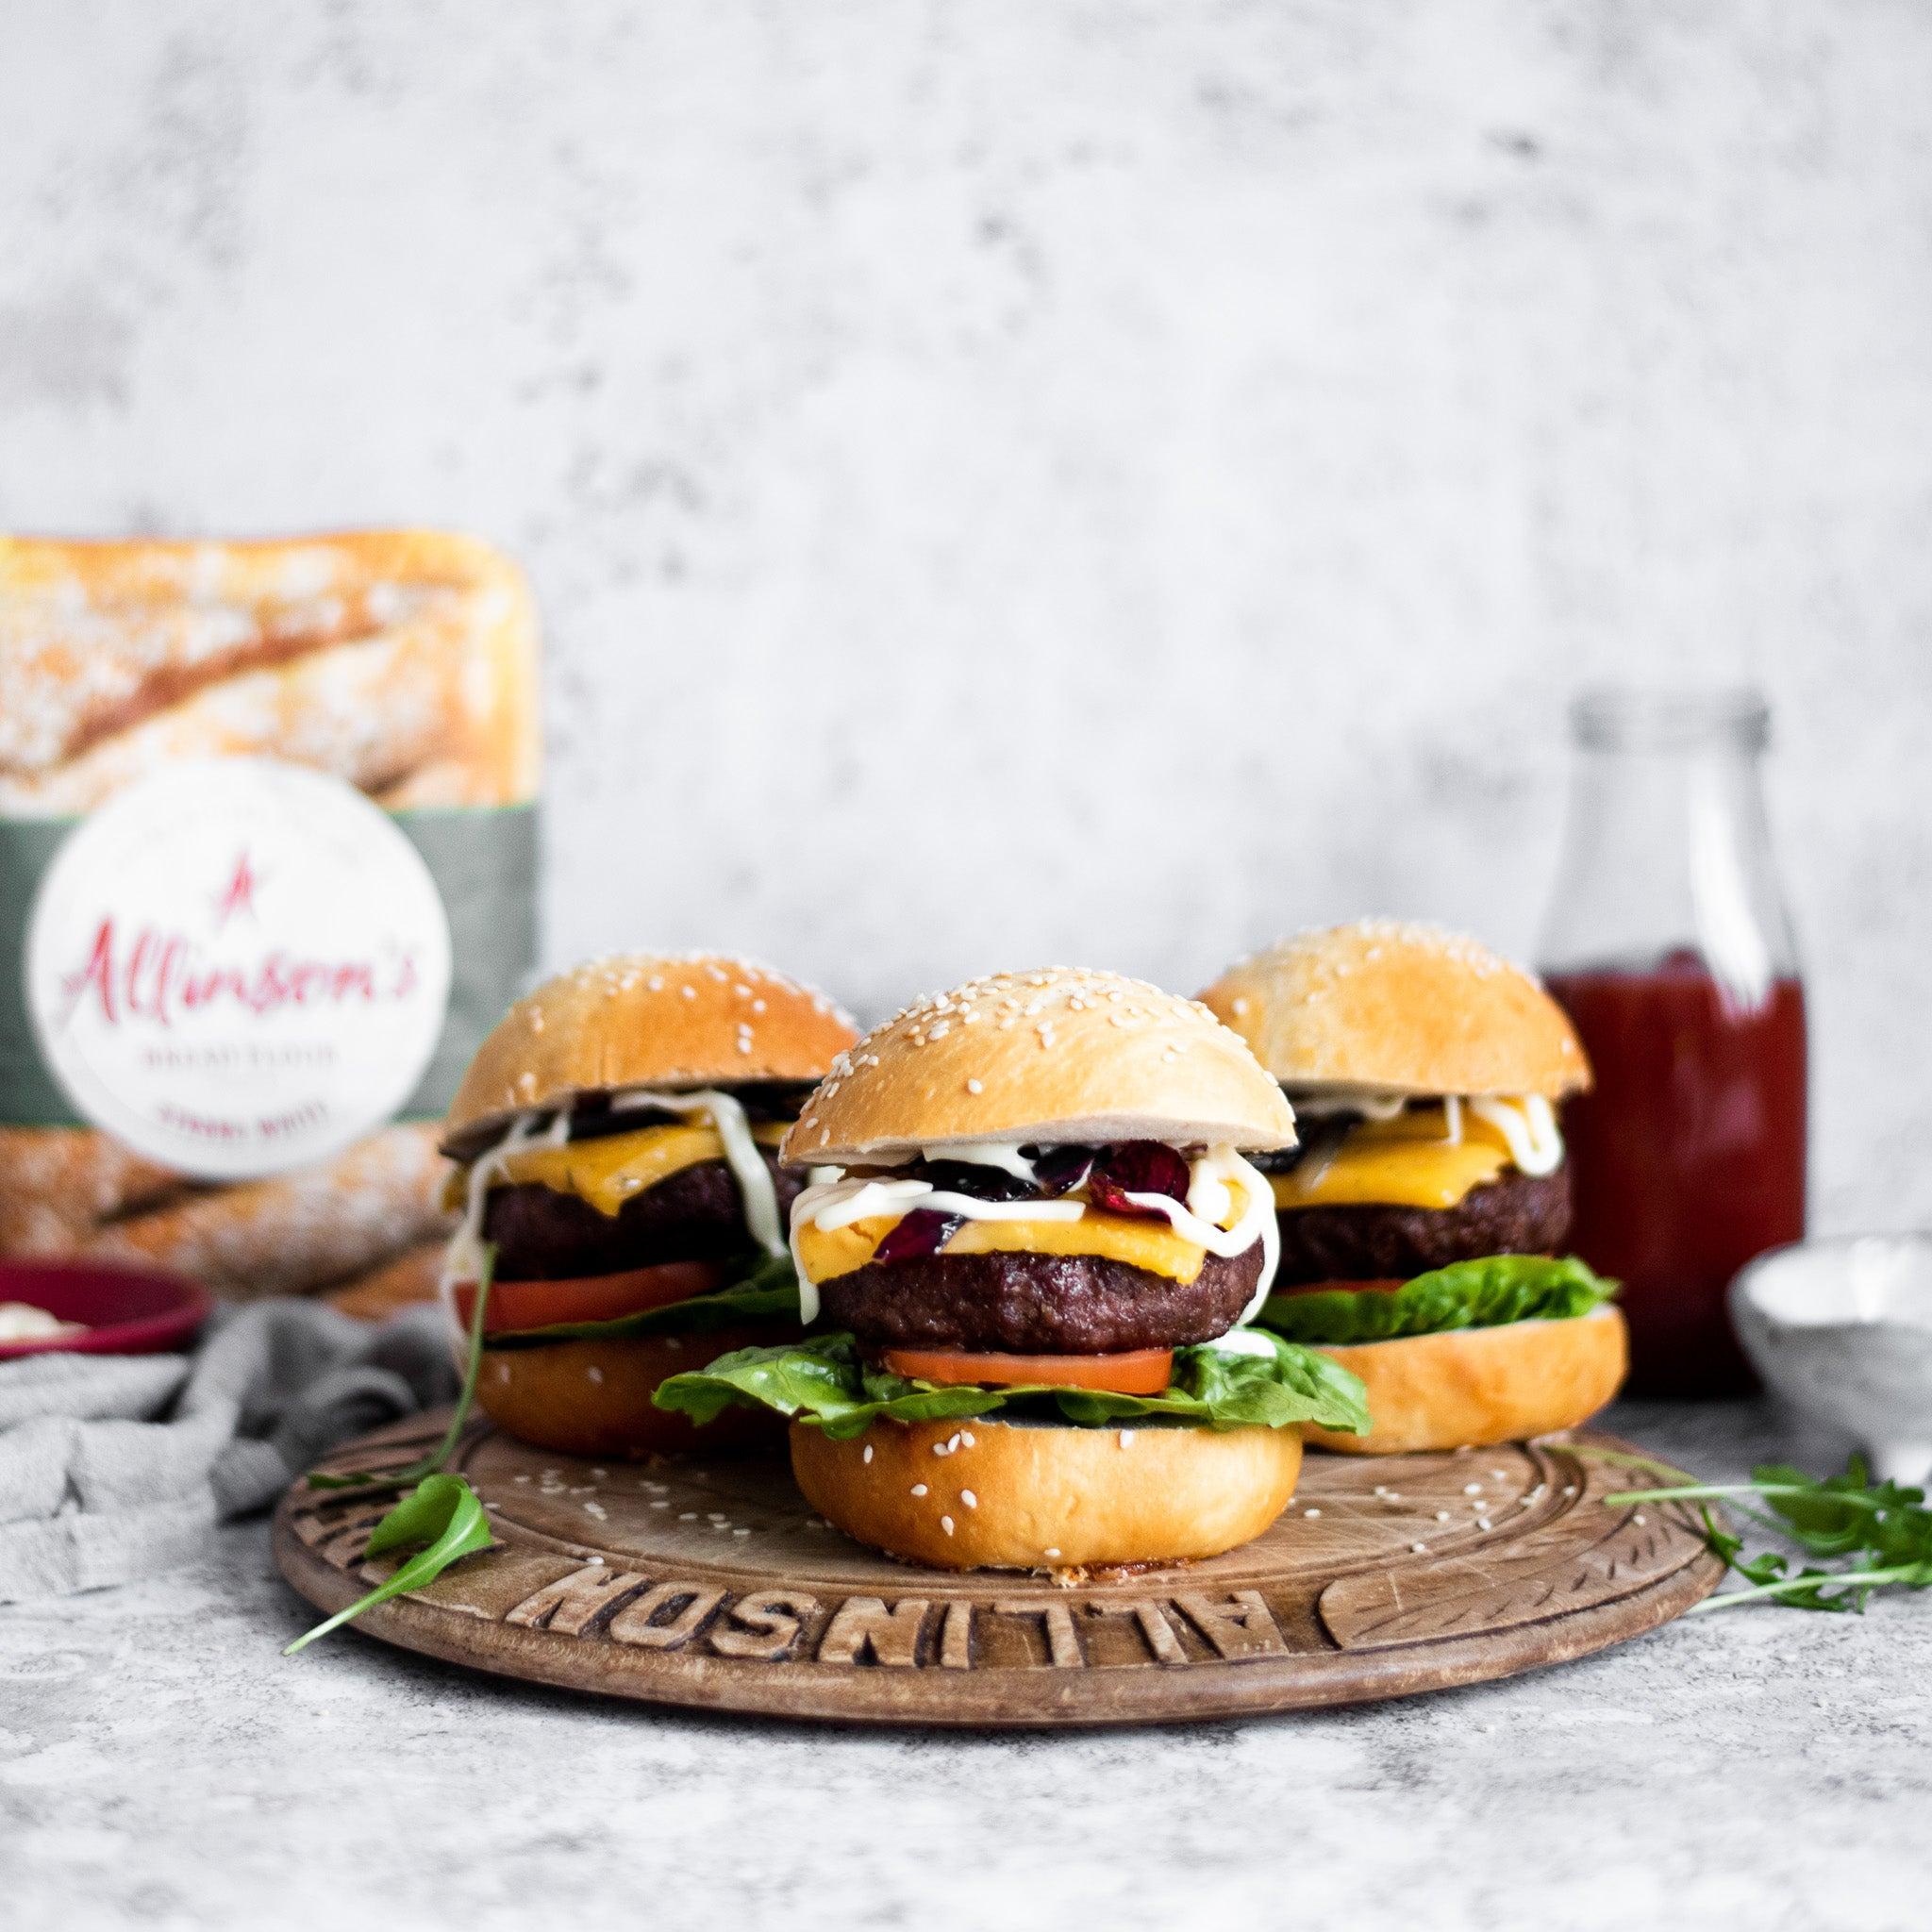 Soft-Burger-Rolls-by-Allinson-s-(9).jpg